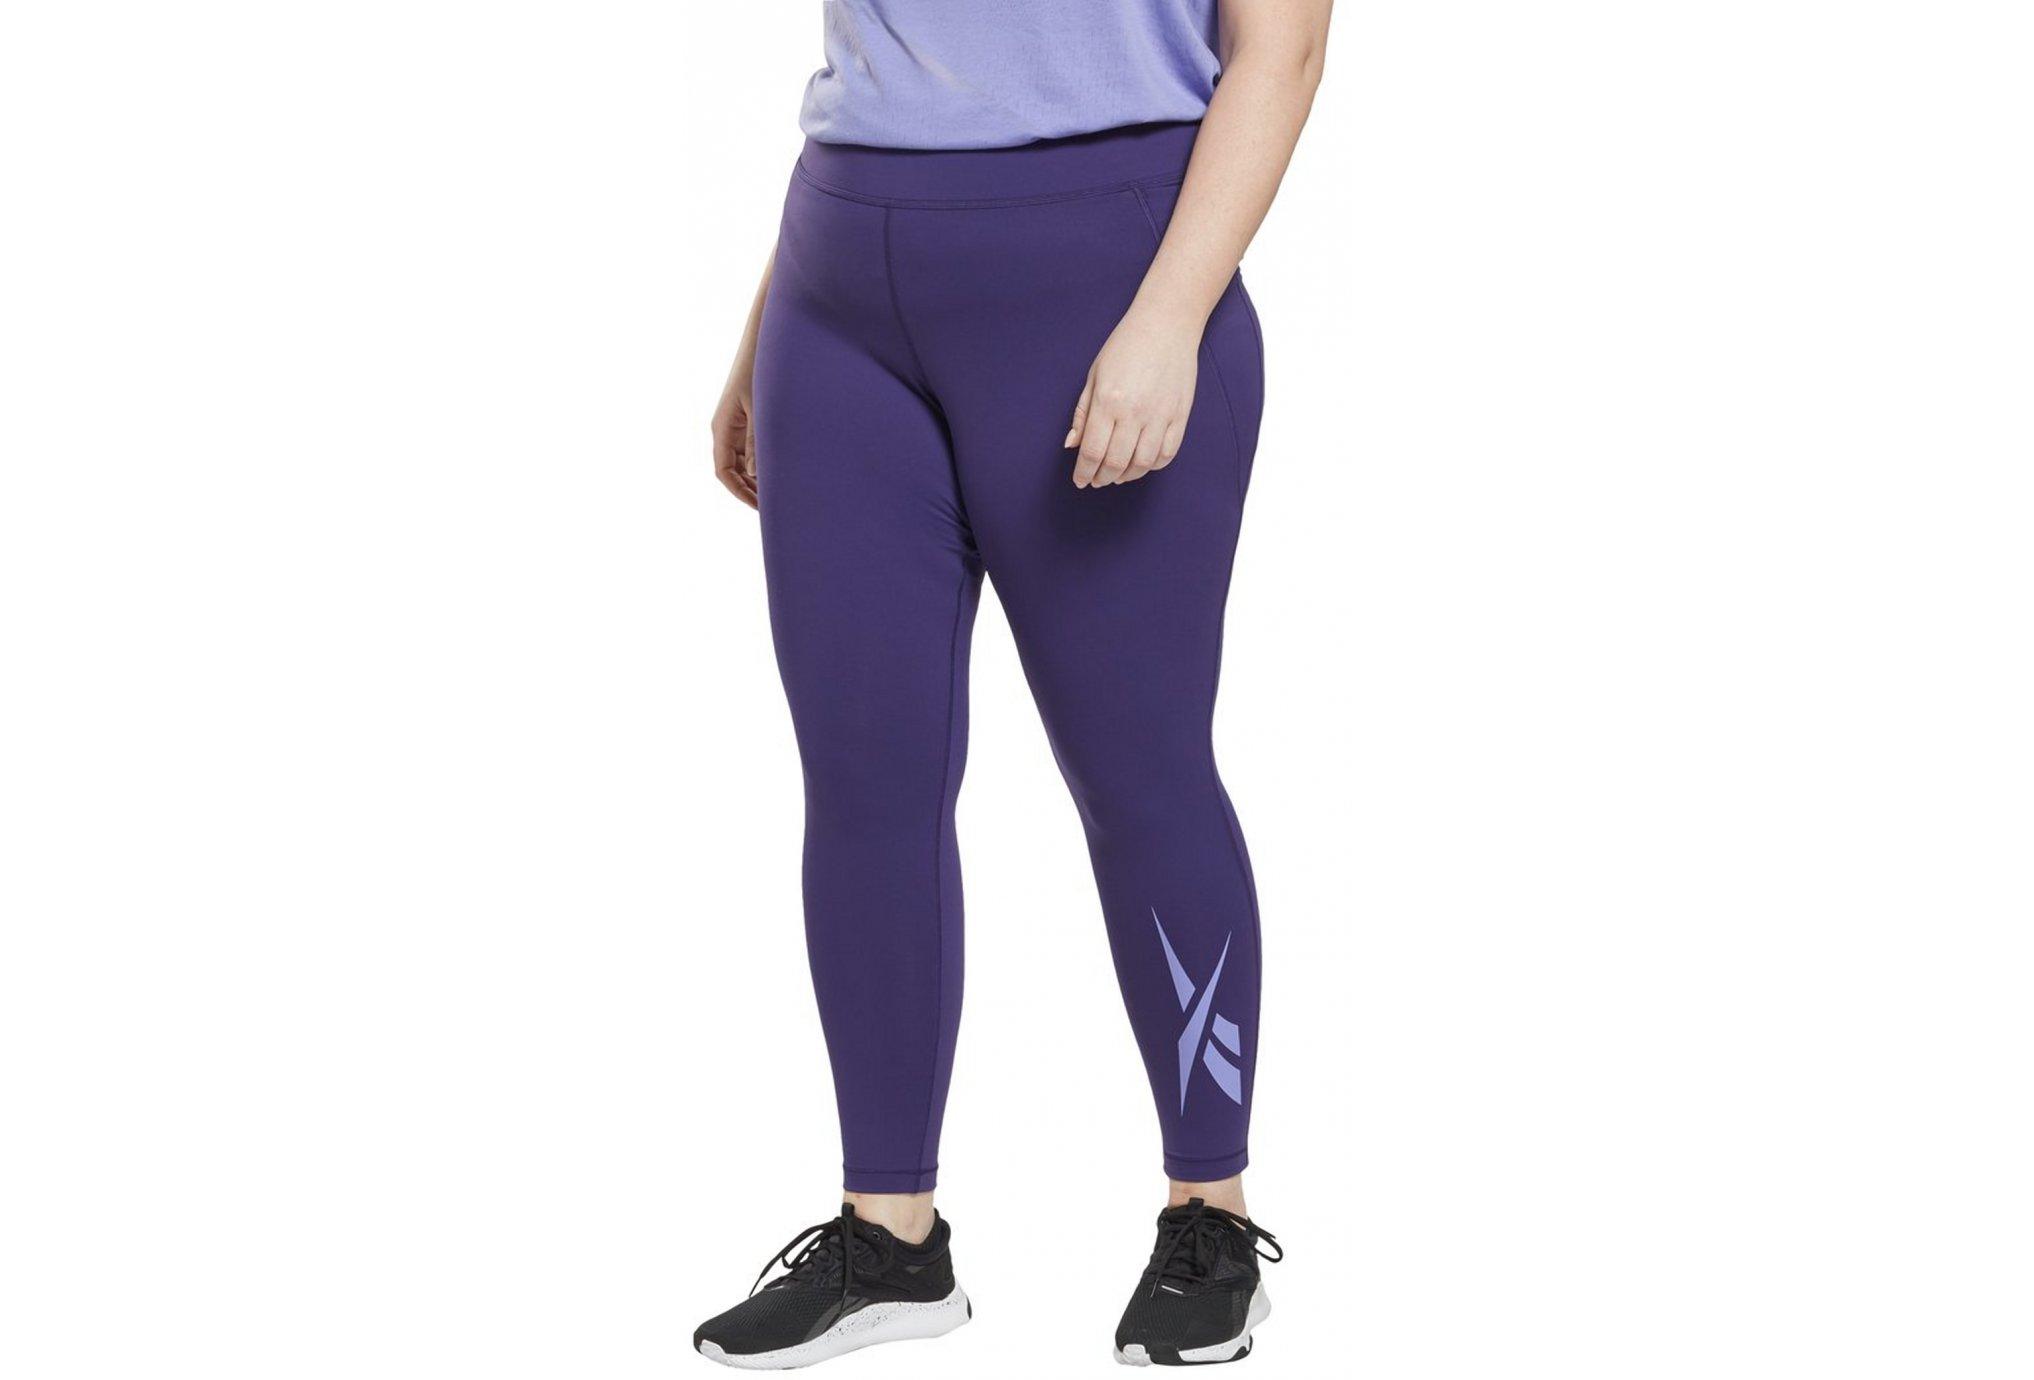 Reebok Lux Vector W - Grande taille vêtement running femme